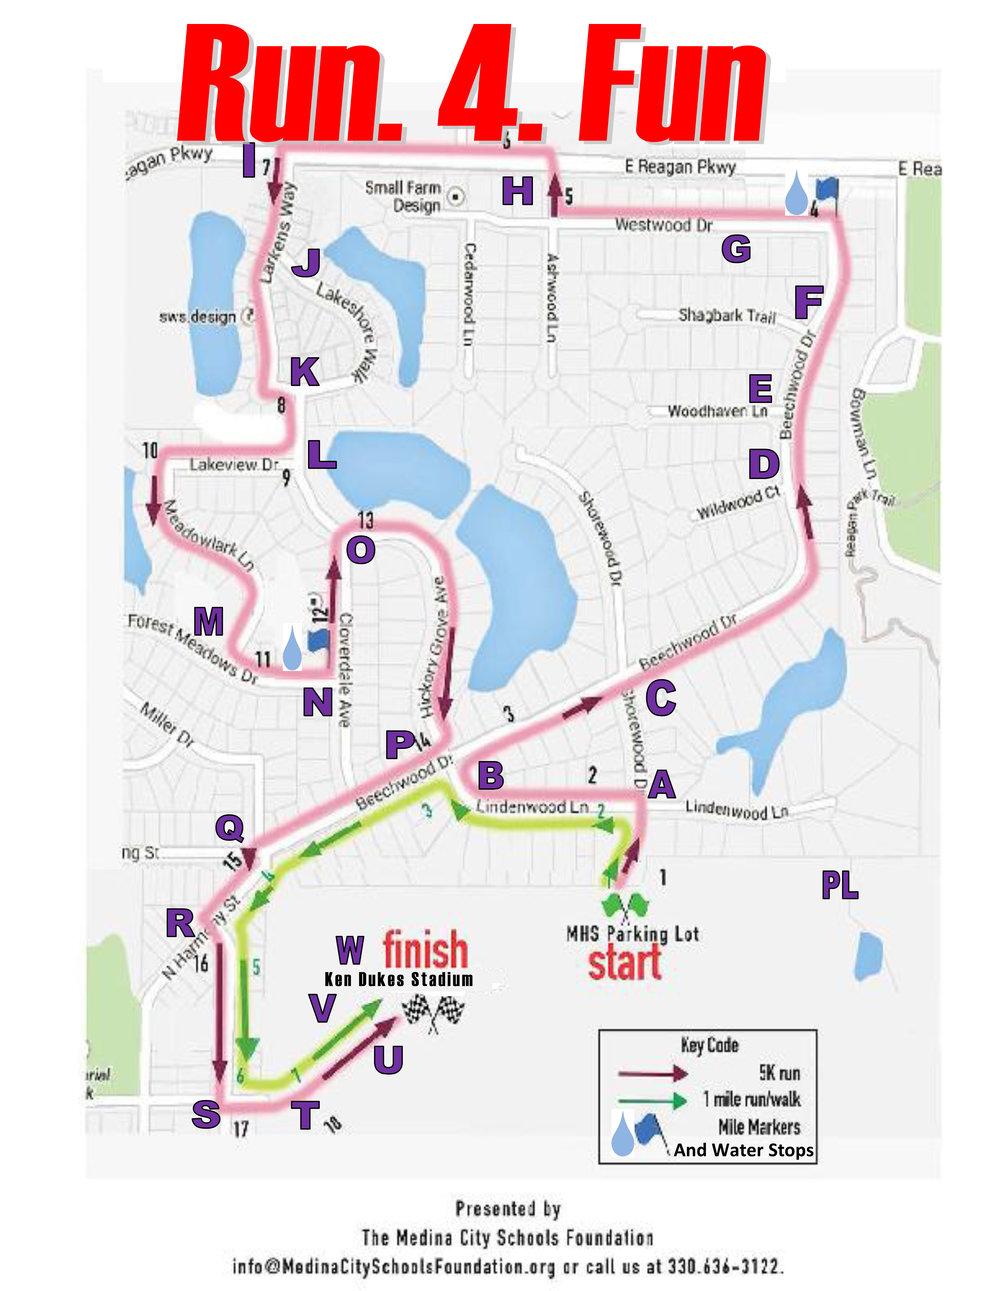 Run for Fun Course Map.jpg